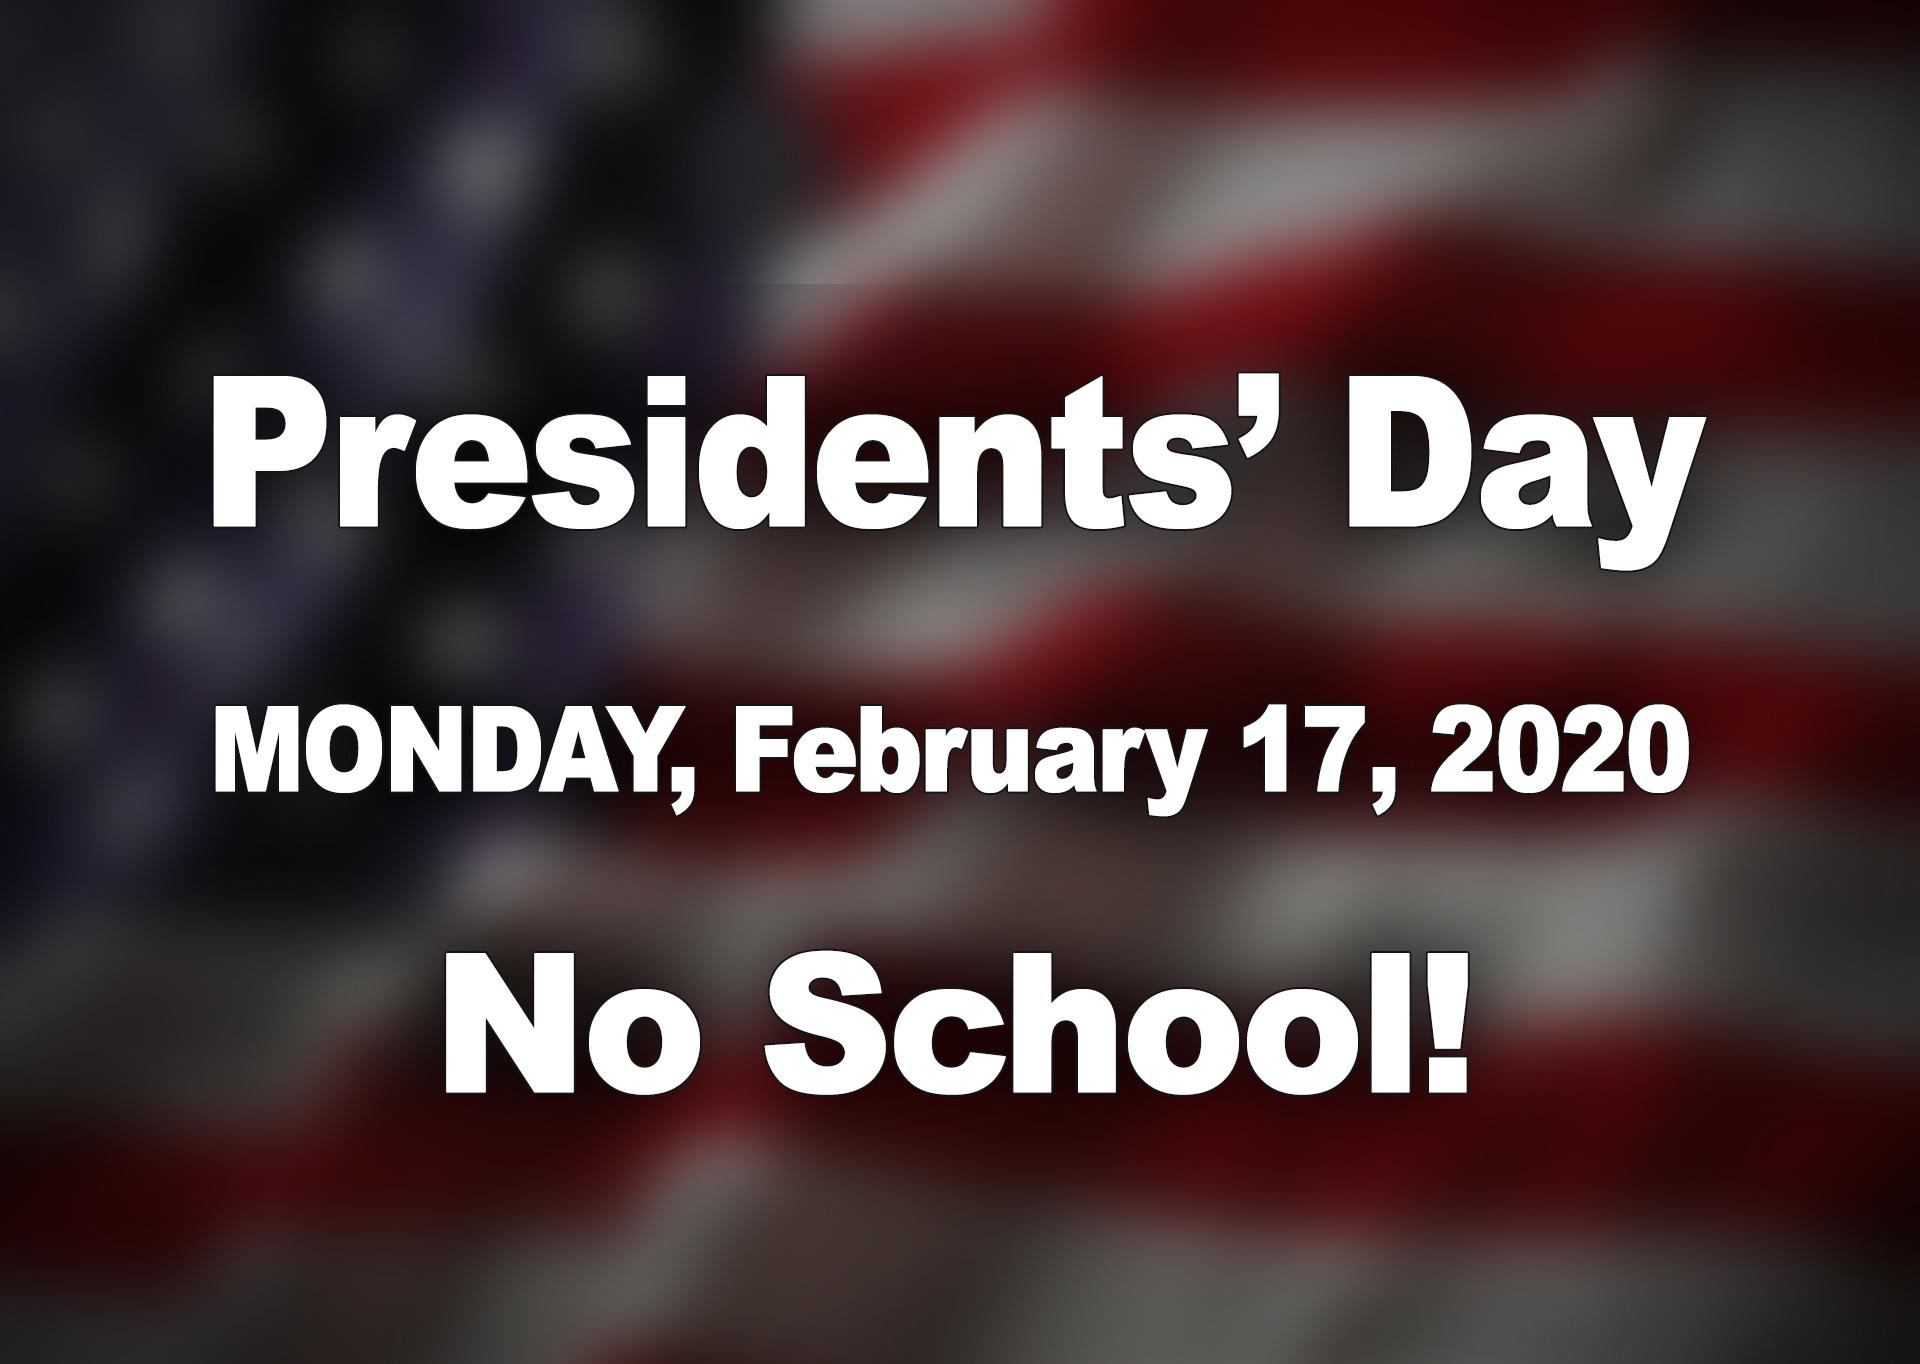 Presidents' Day, Monday, February 17, 2020 - No School!